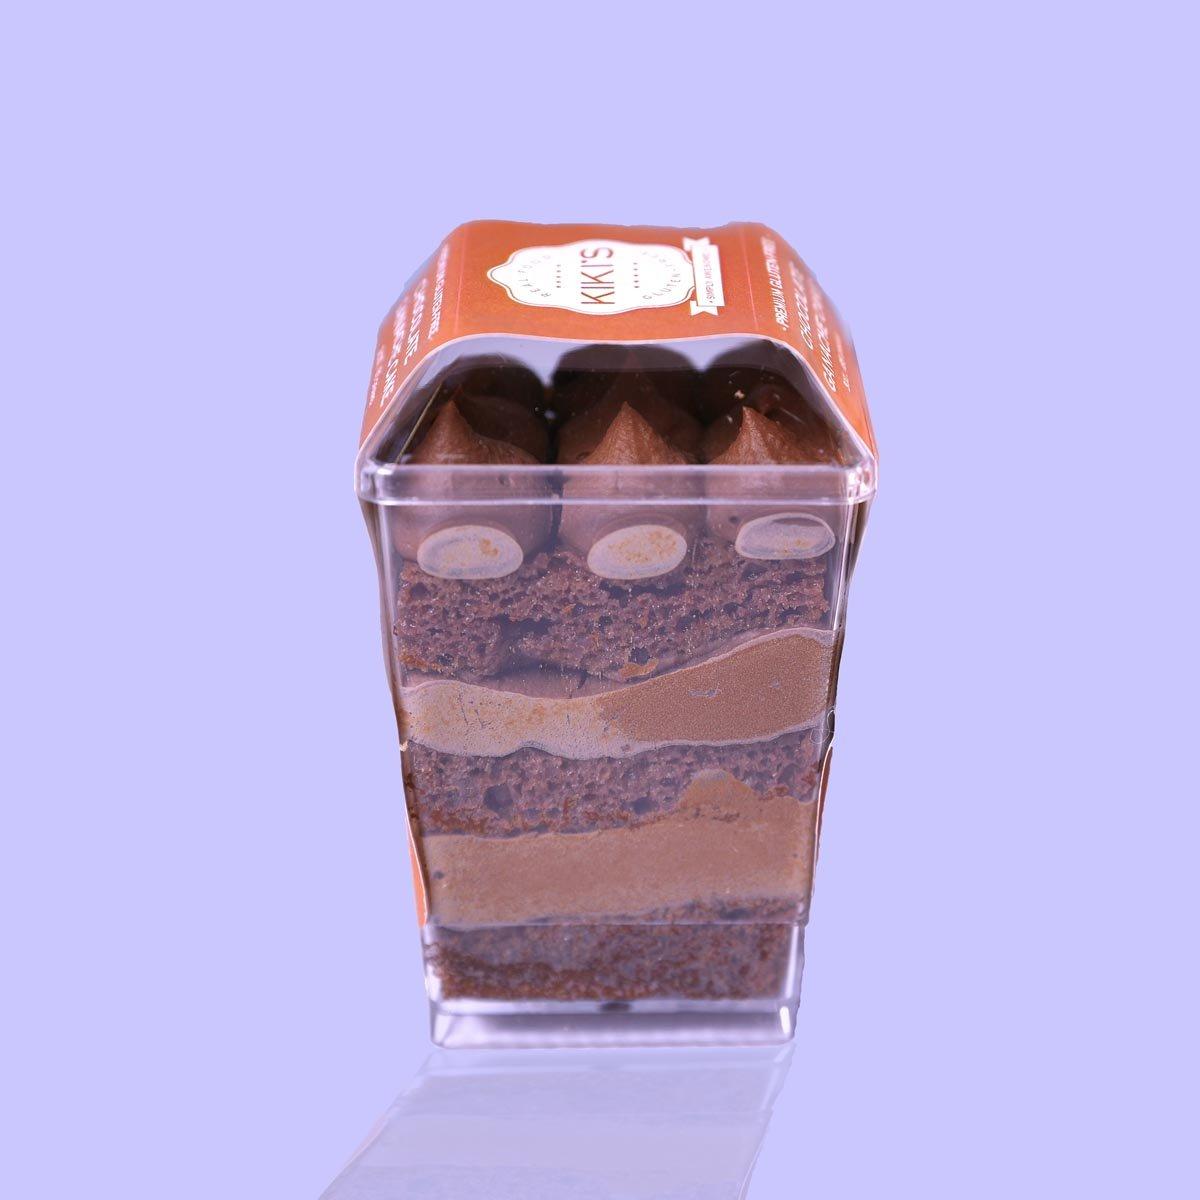 Chocolate Ganache Cake Feature